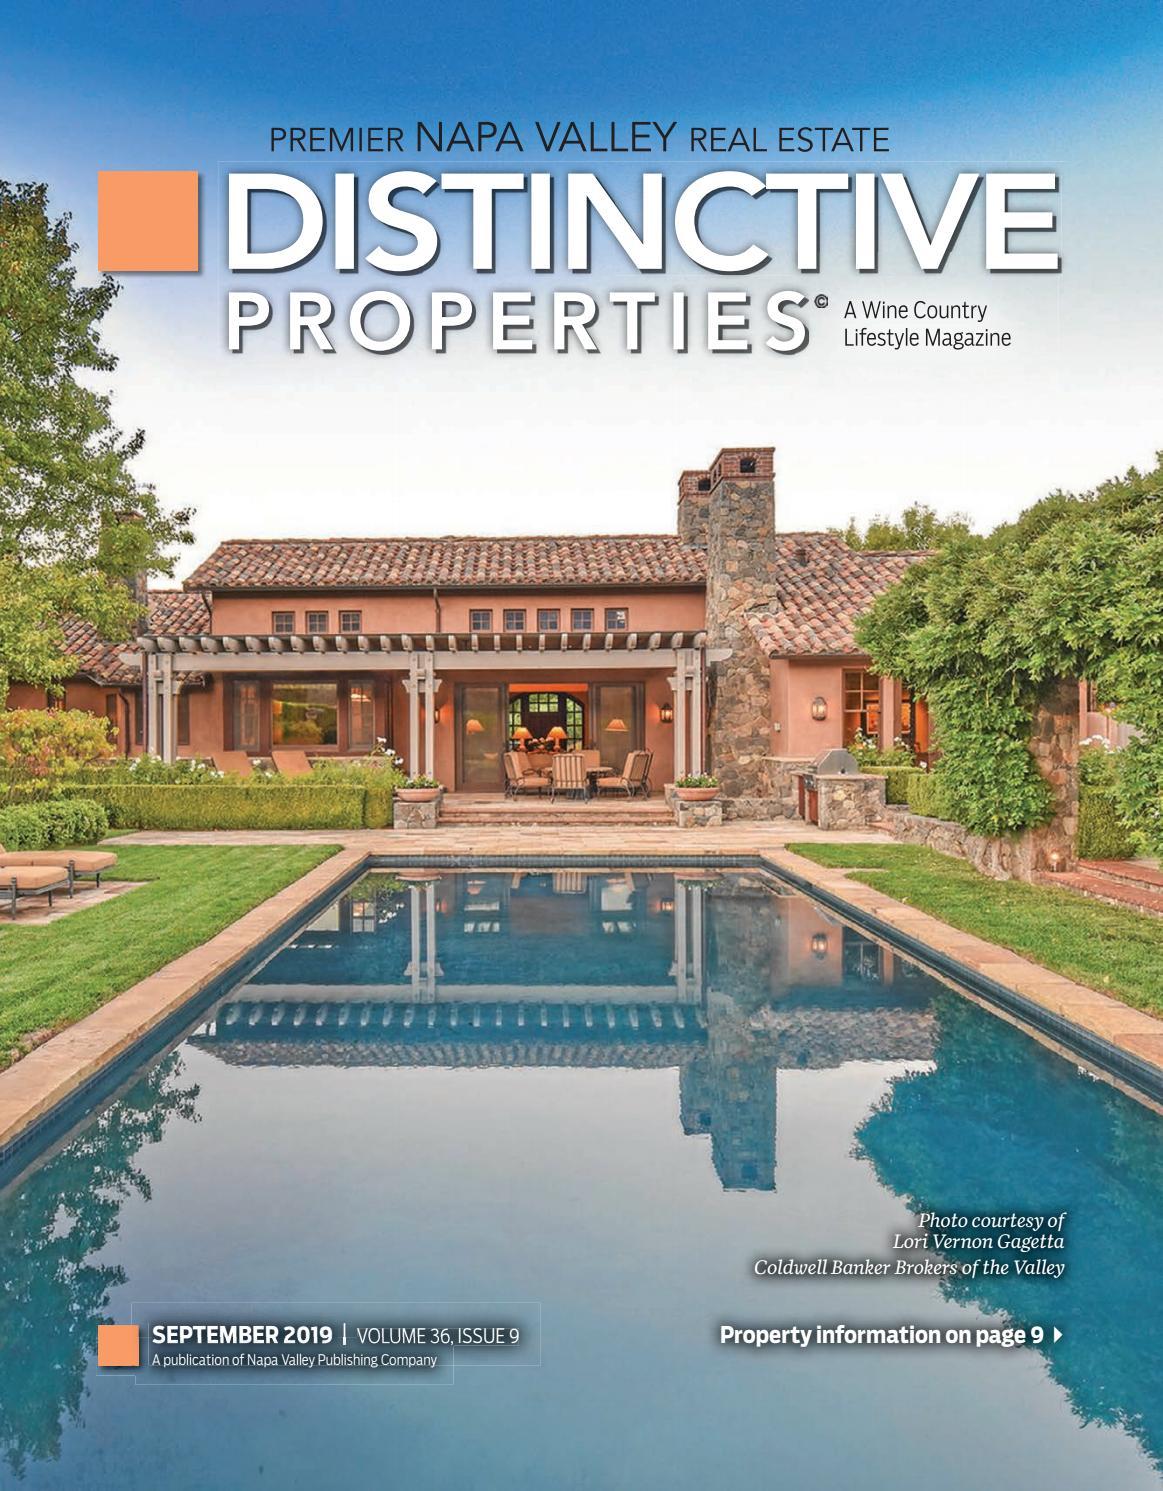 Distinctive Properties - Sep 2019 by Napa Register - issuu